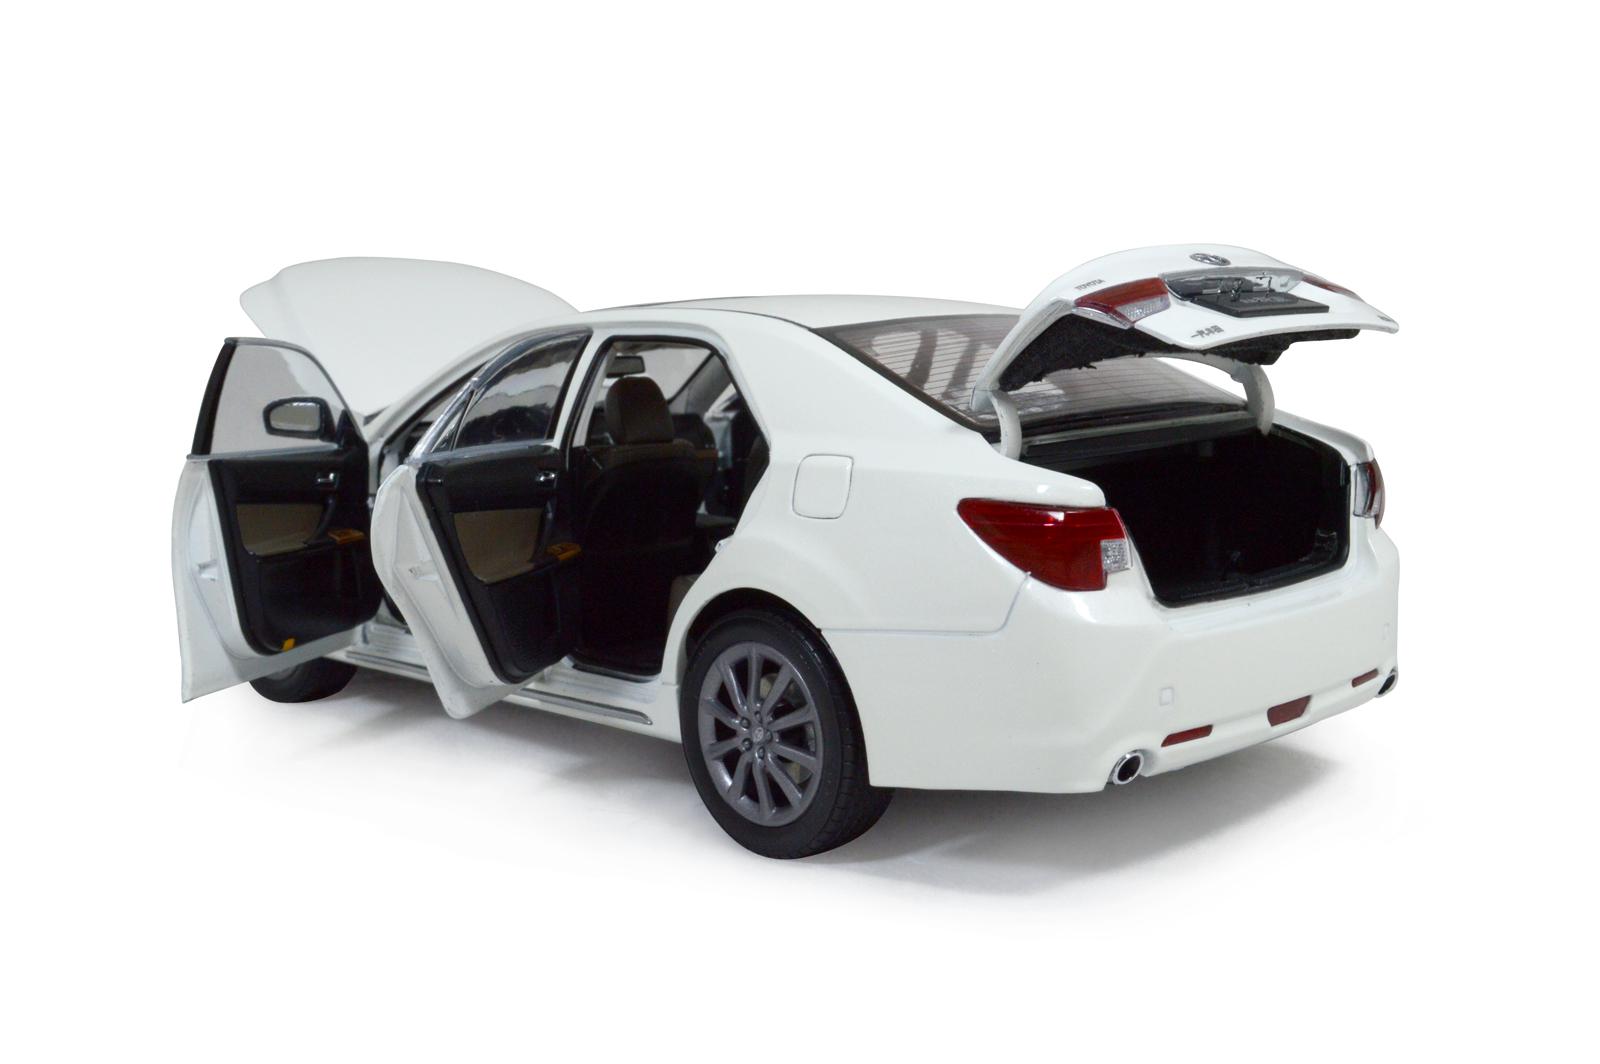 Toyota Reiz 2014 1 18 Scale Diecast Model Car Wholesale